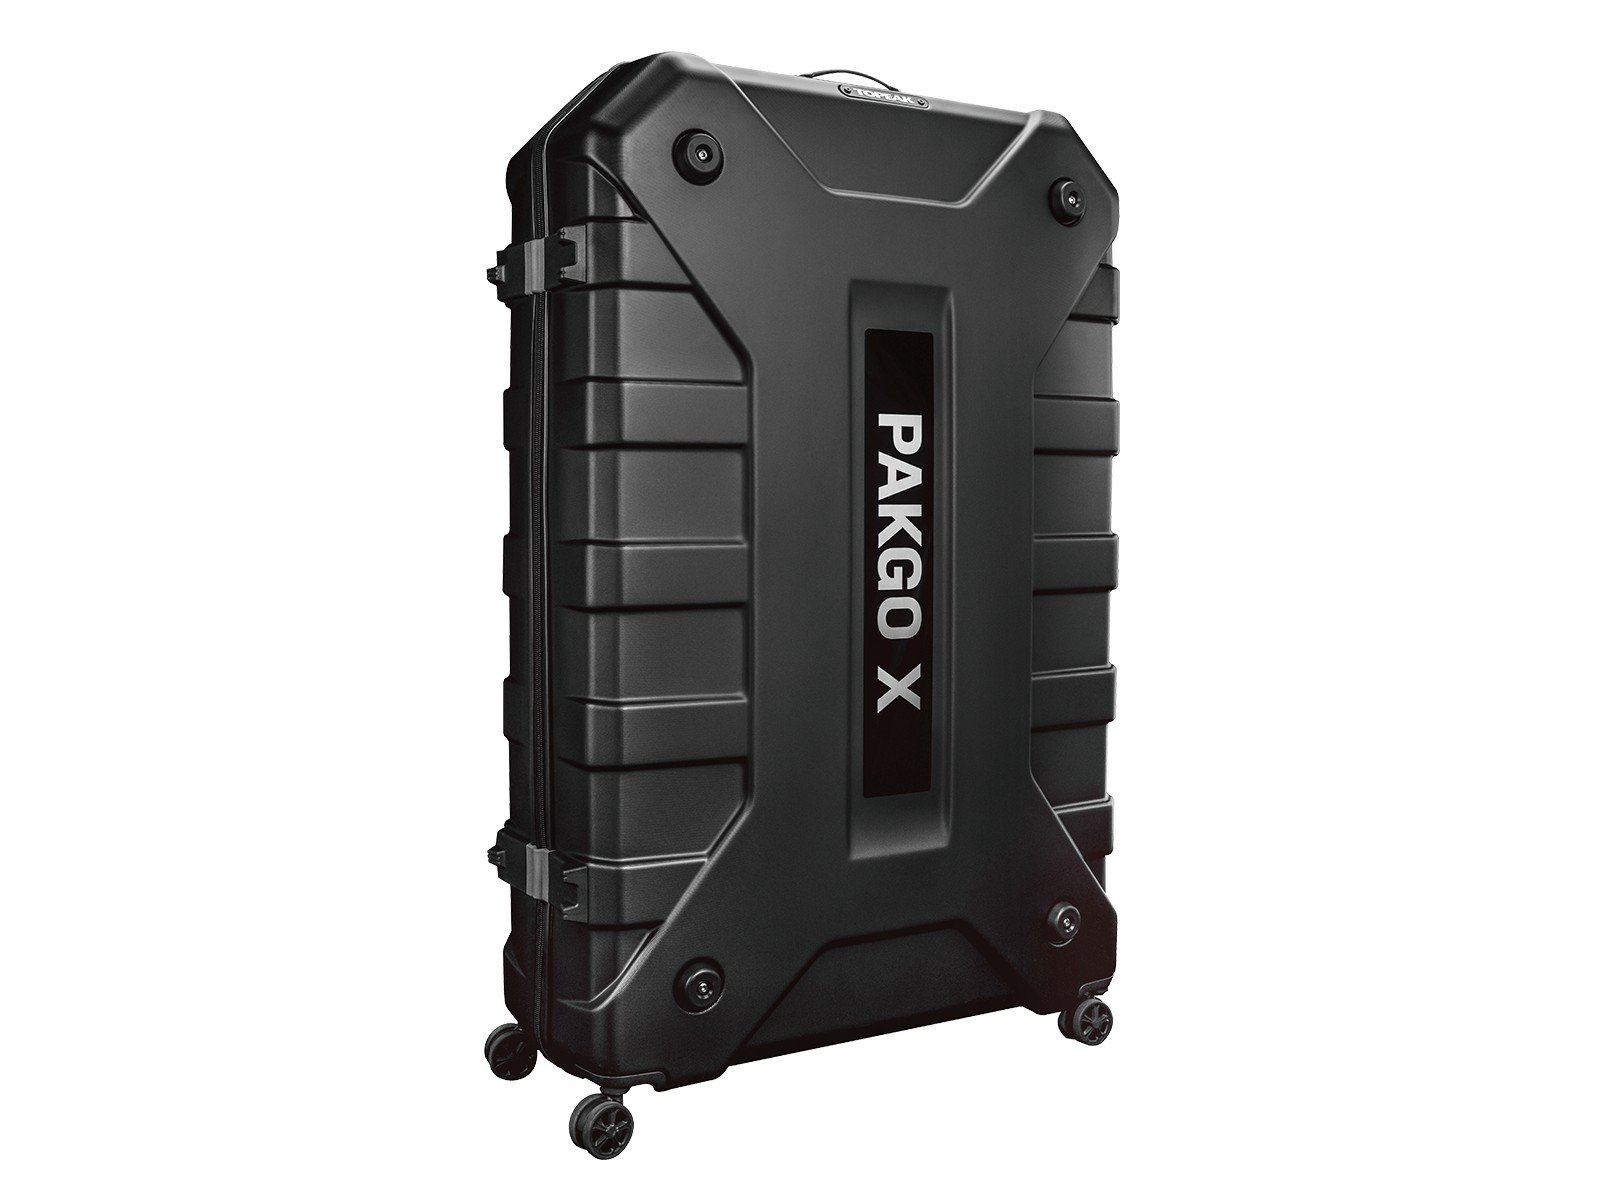 Topeak Pakgo X hardcase cykelkuffert til racercykler - 4.999,00 | Bike bags